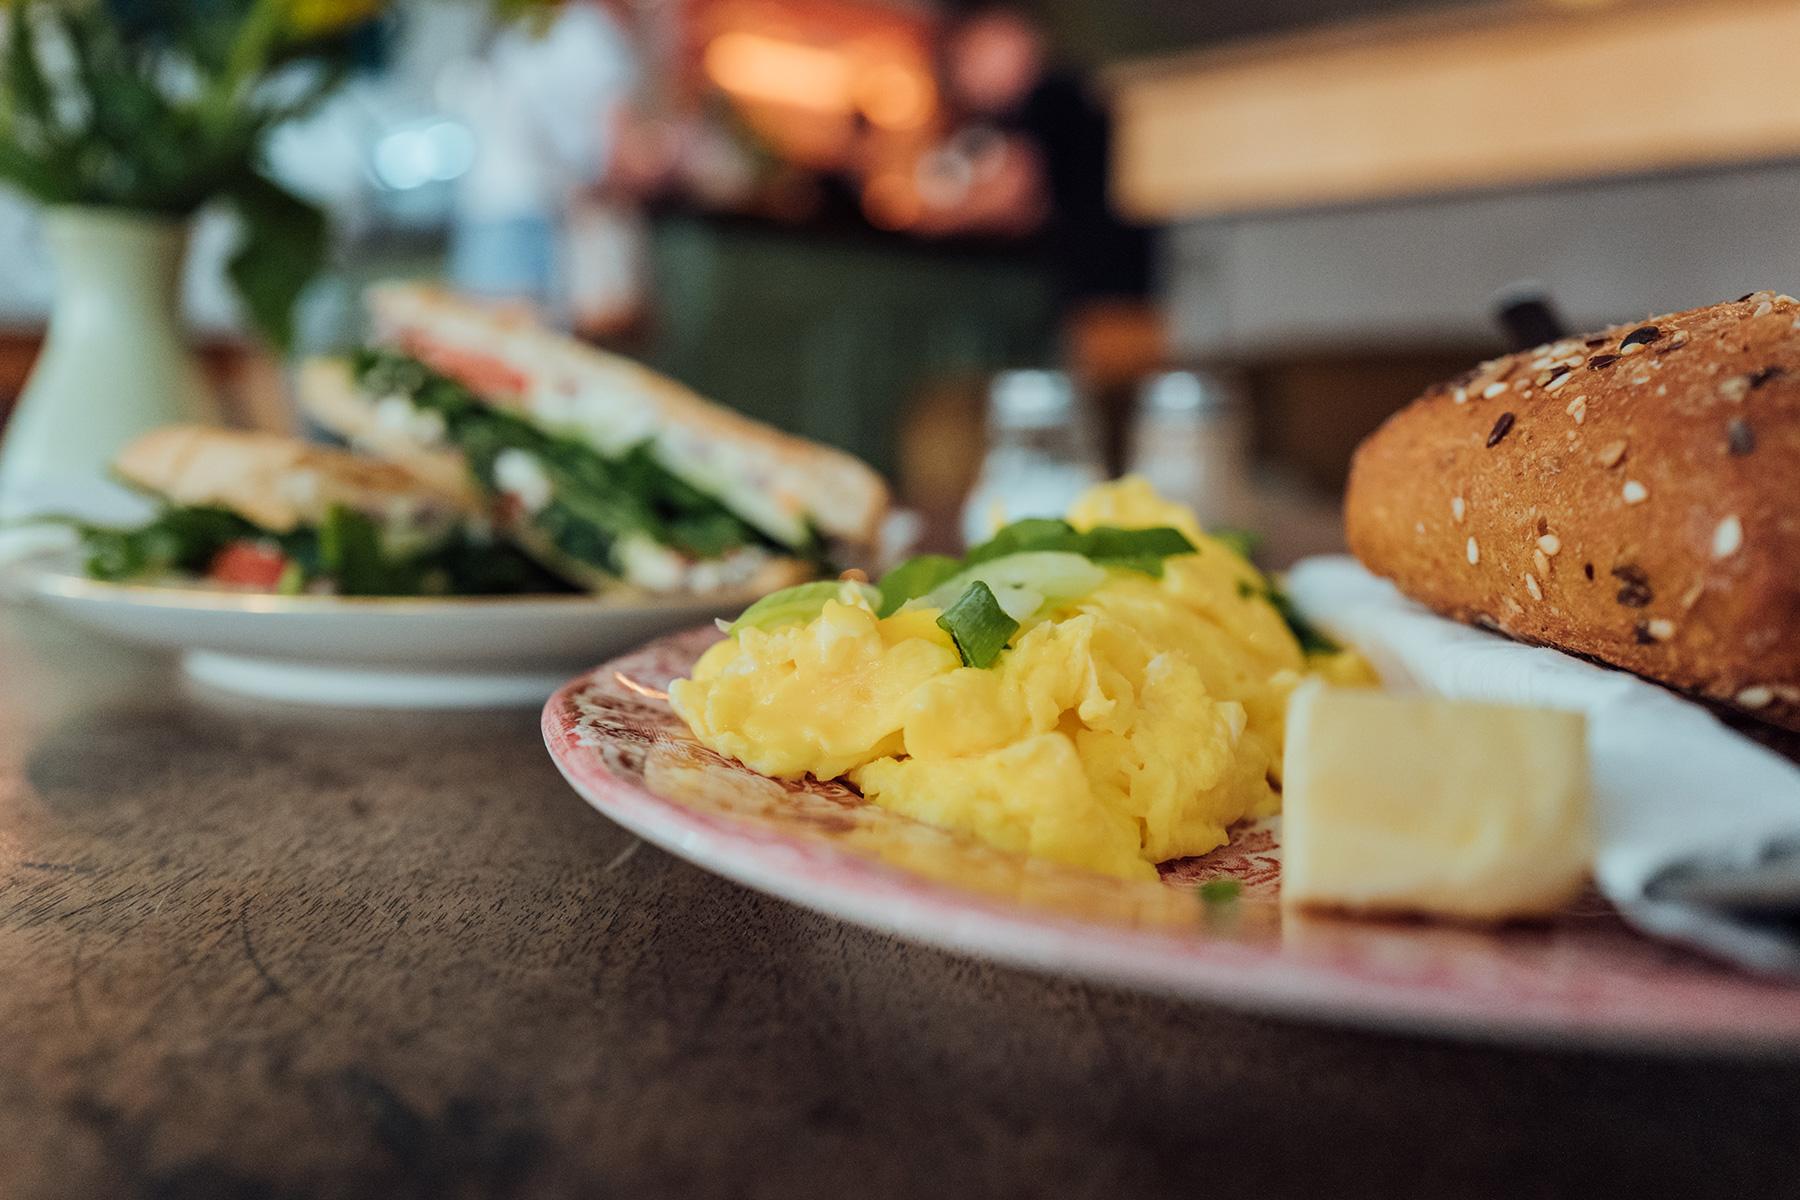 Kraweel StPauli cafe geheimtipp hamburg lisa knauer 16